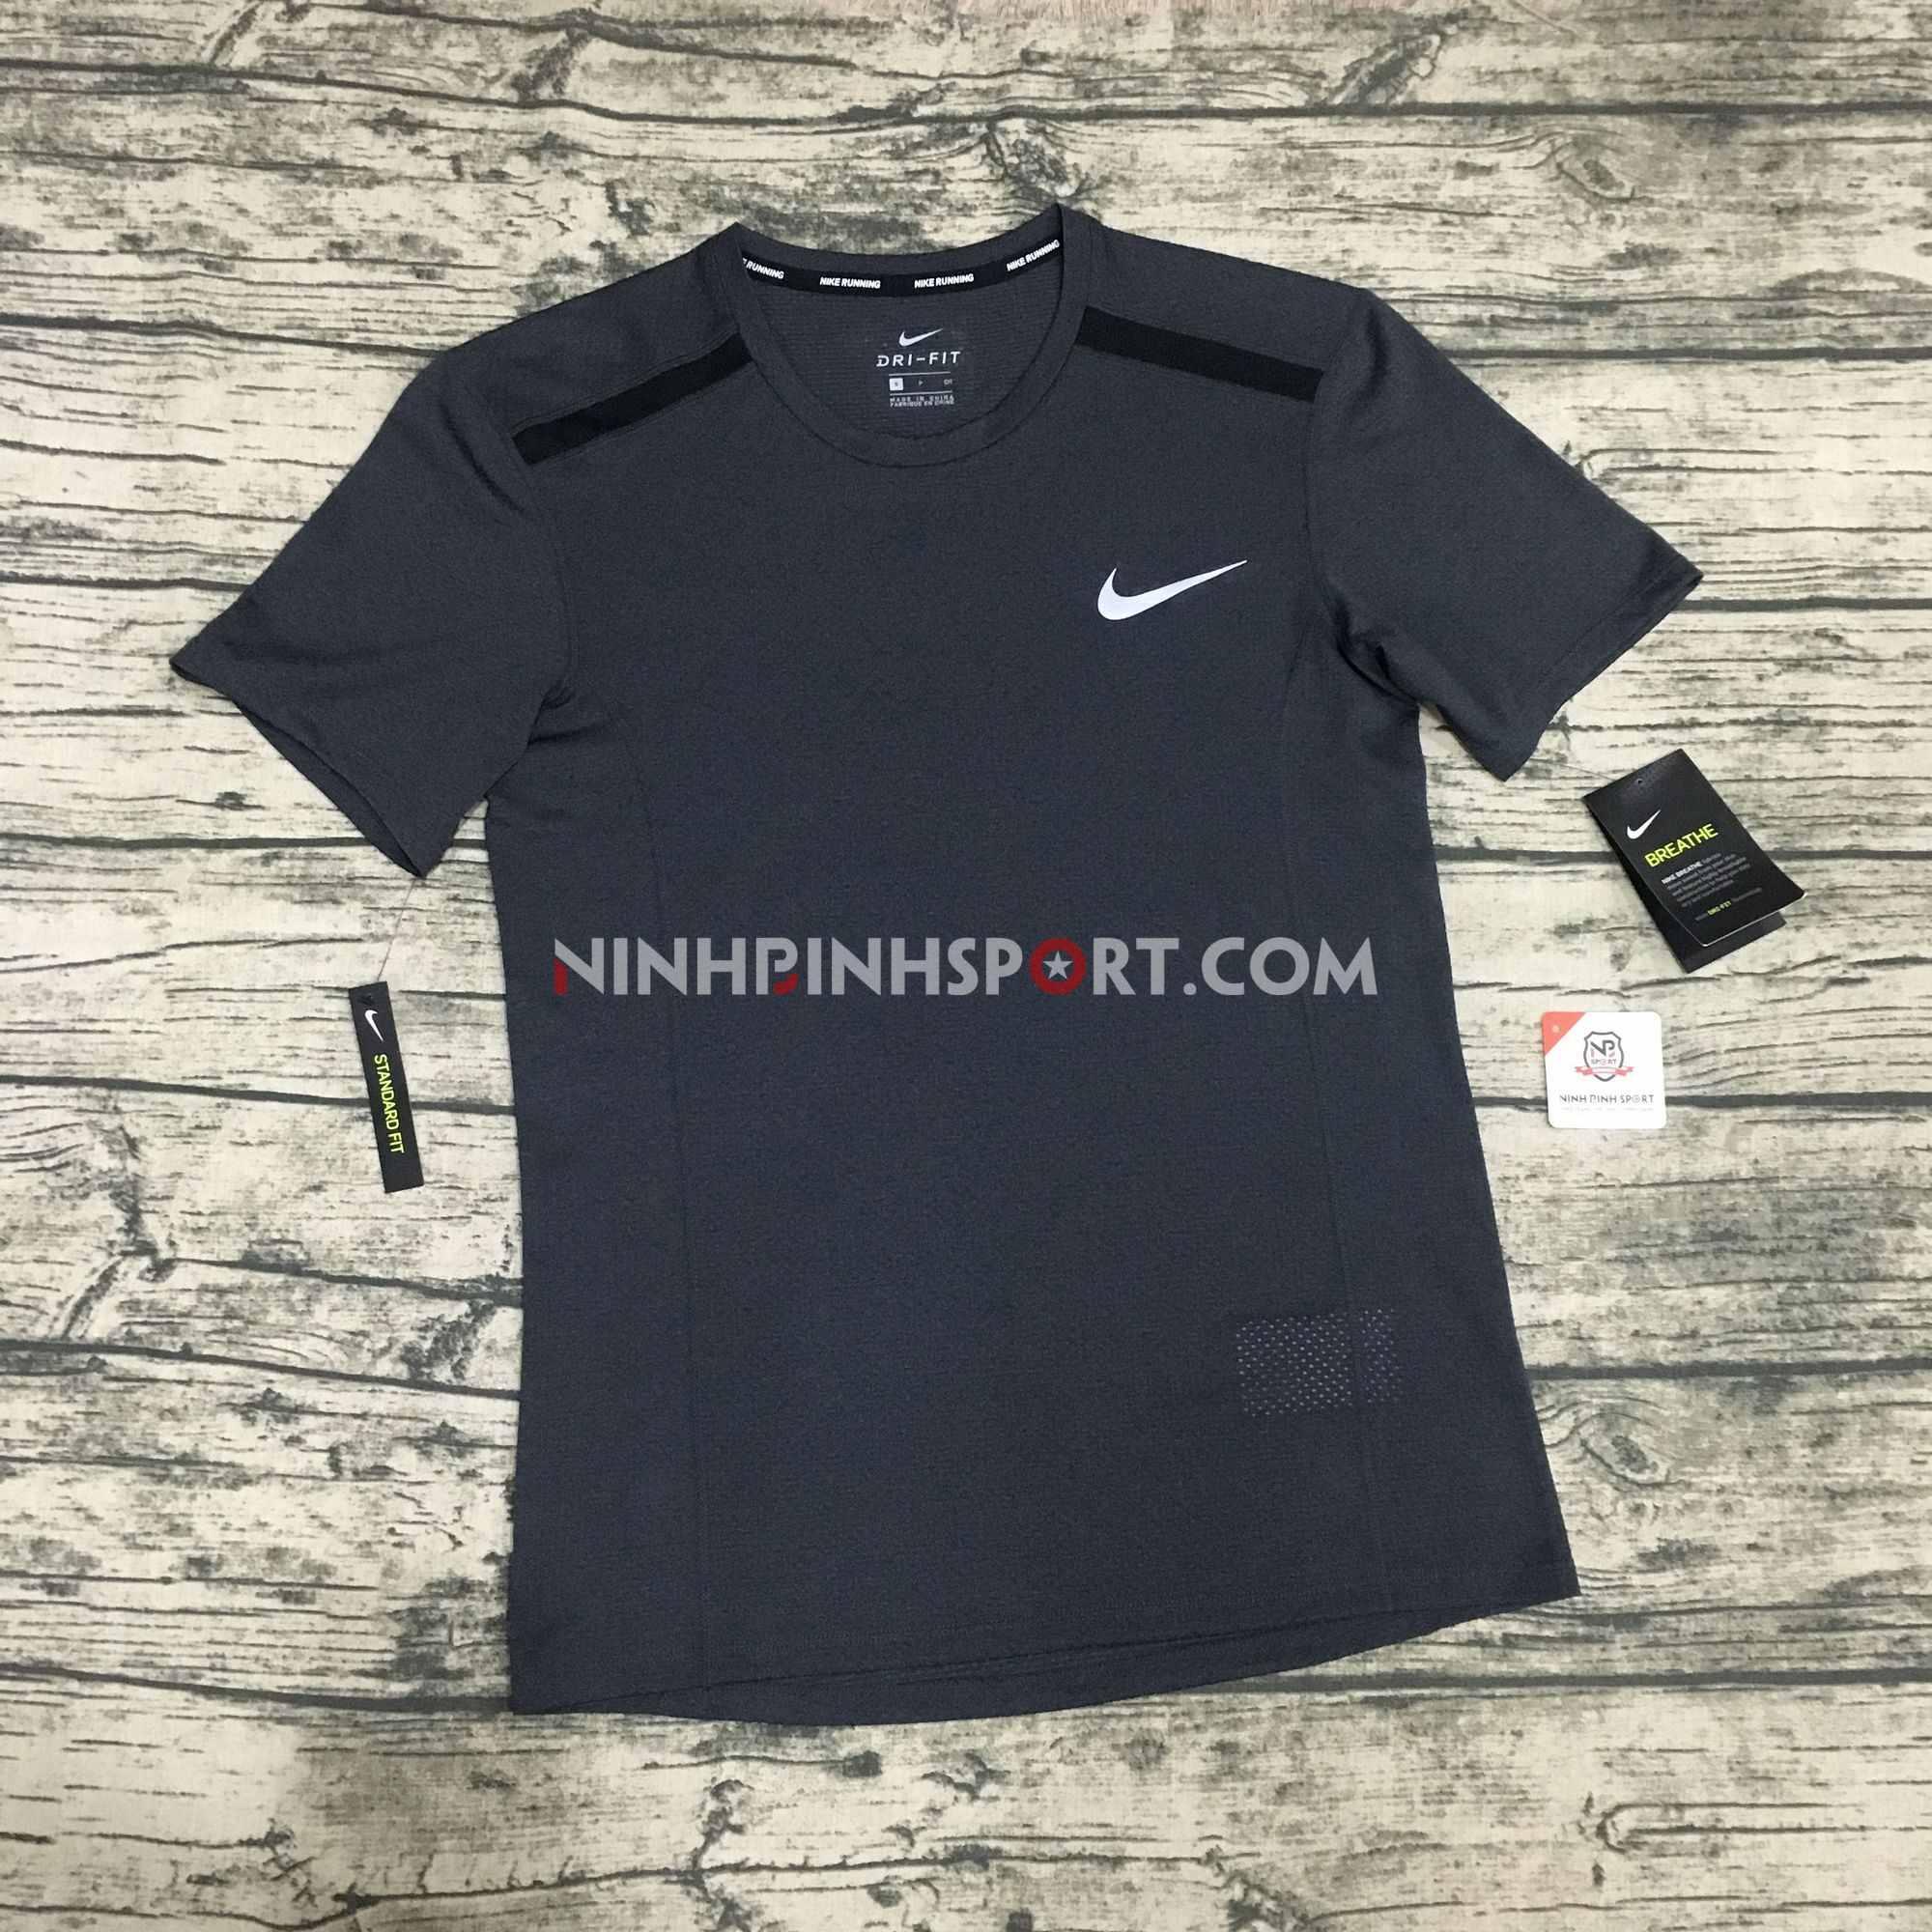 Áo thể thao nam Nike Breathe Cool Miler S/S Top 892995-010